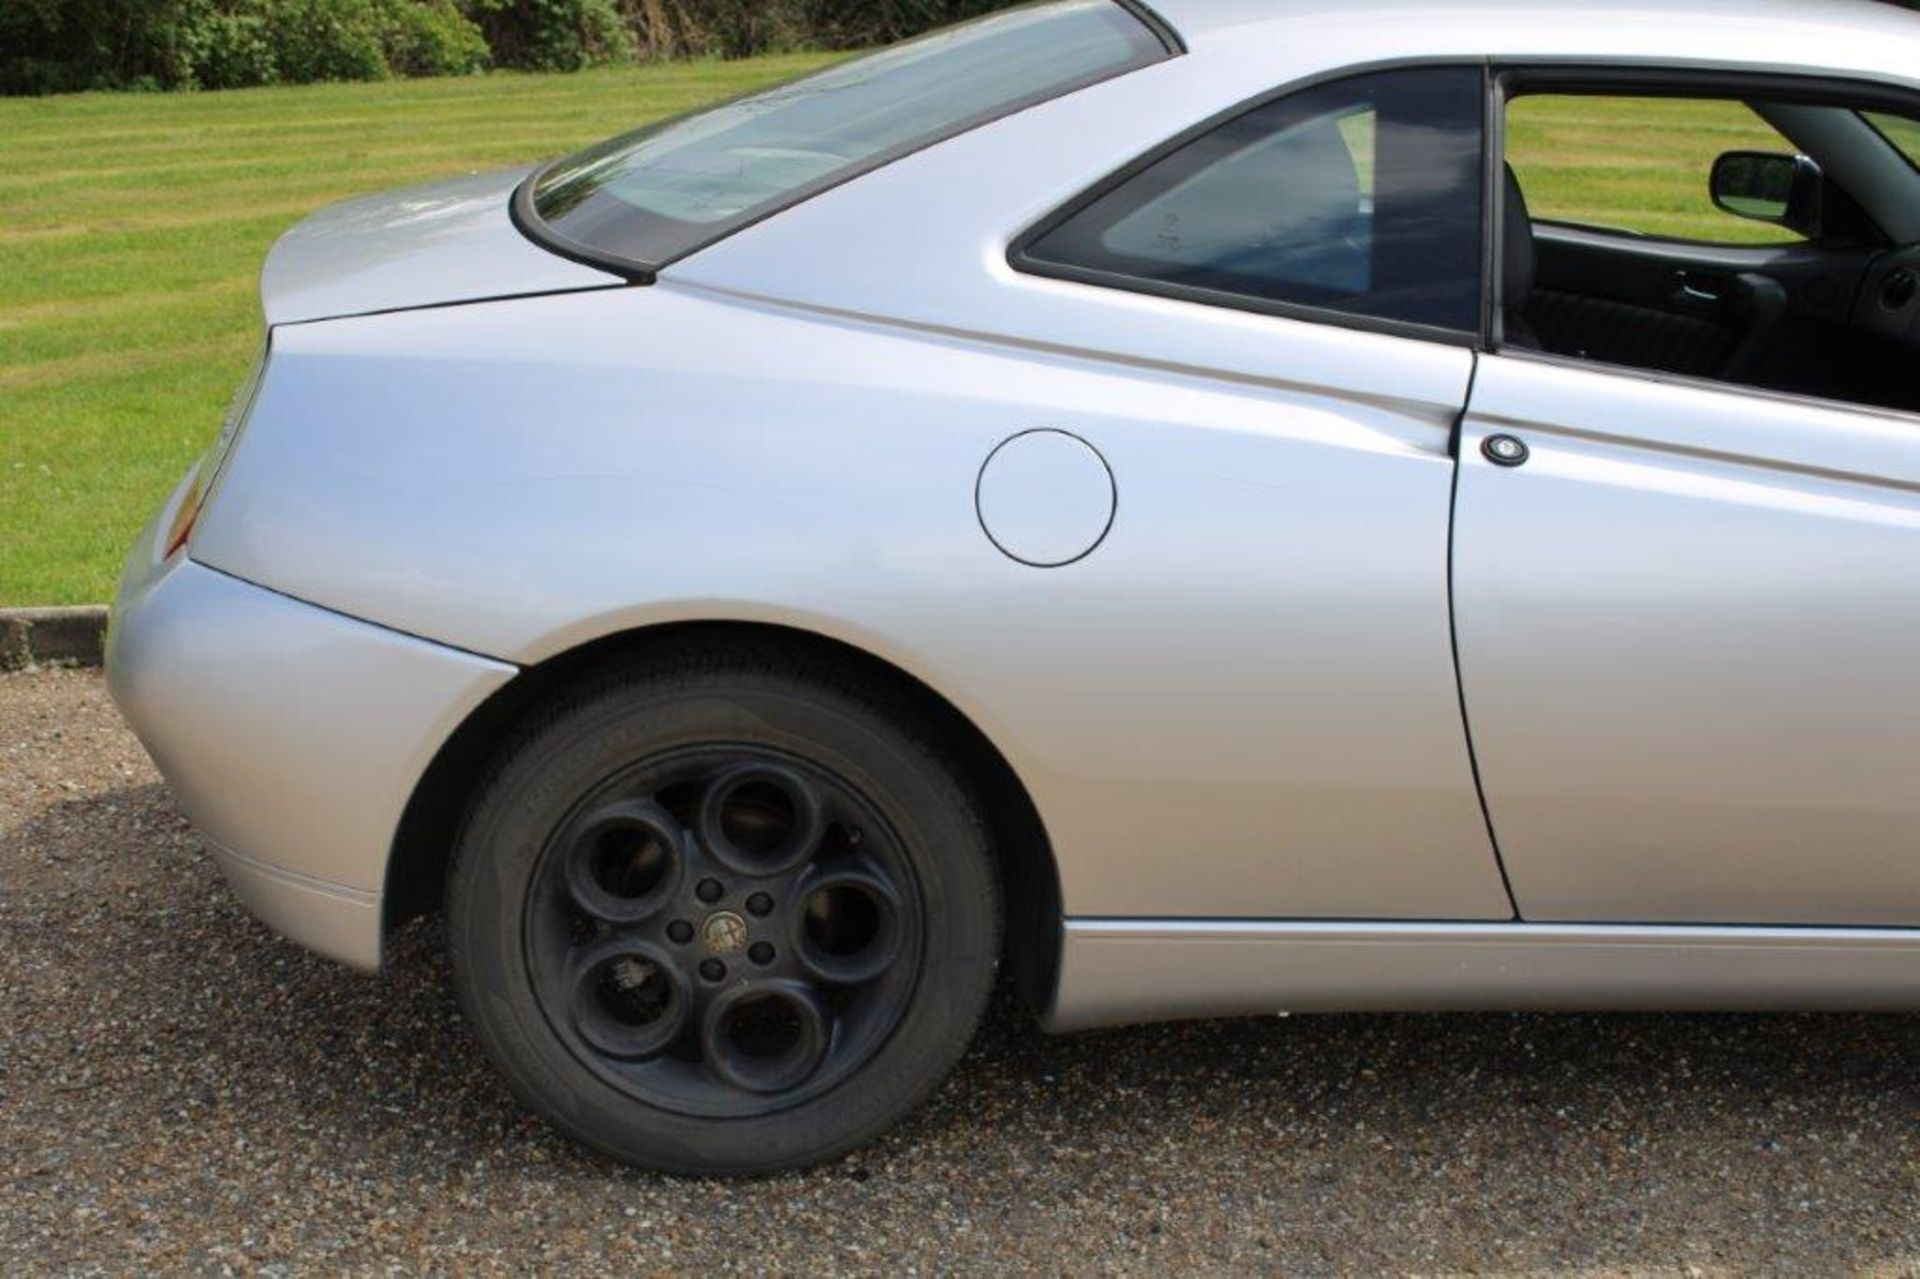 1999 Alfa Romeo GTV Lusso T-Spark 16v - Image 3 of 18